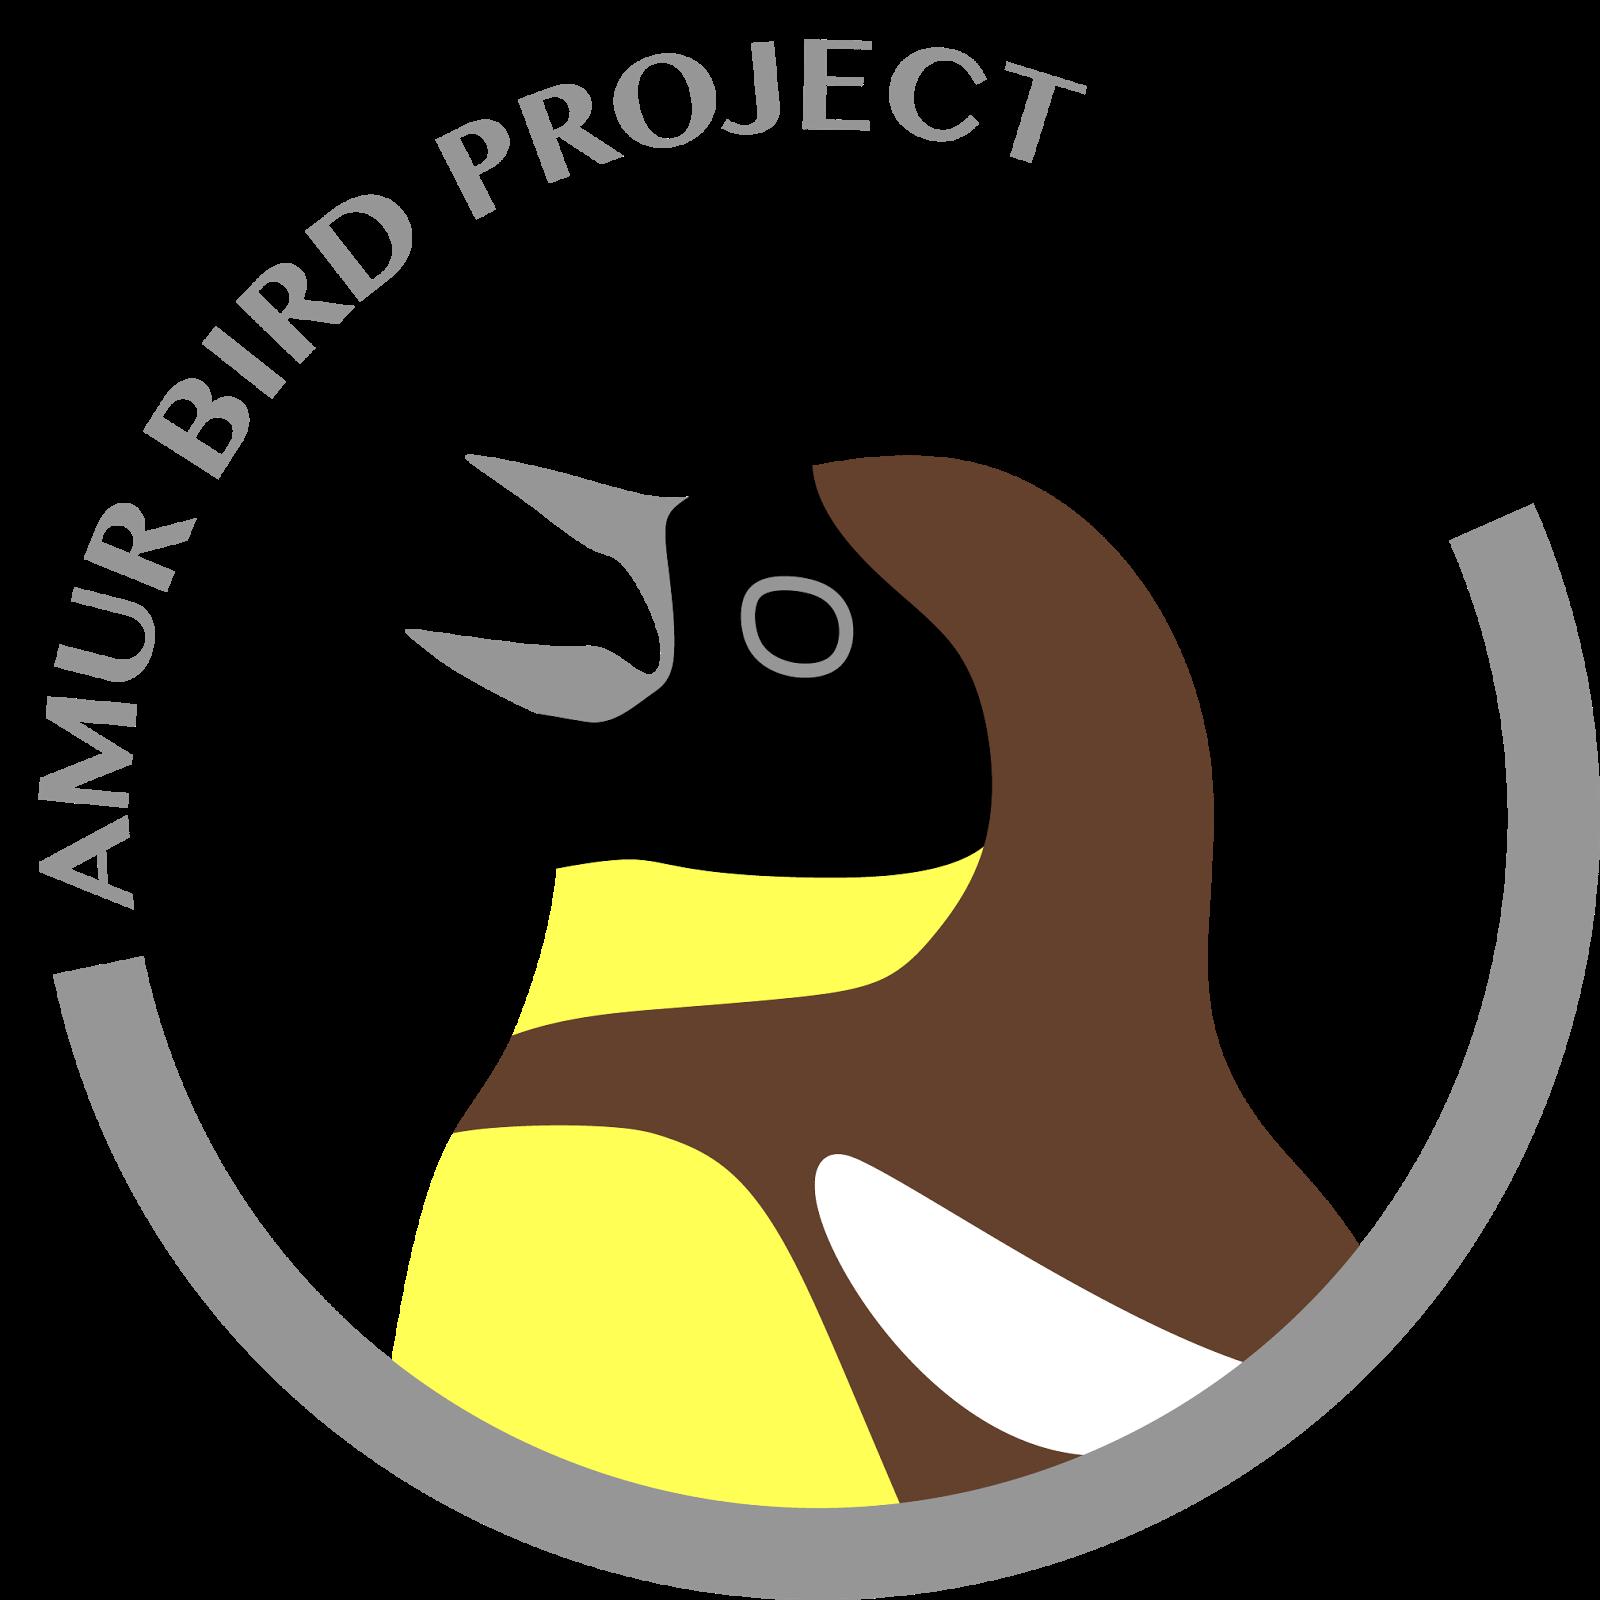 Amur bird project . Falcon clipart yellow warbler